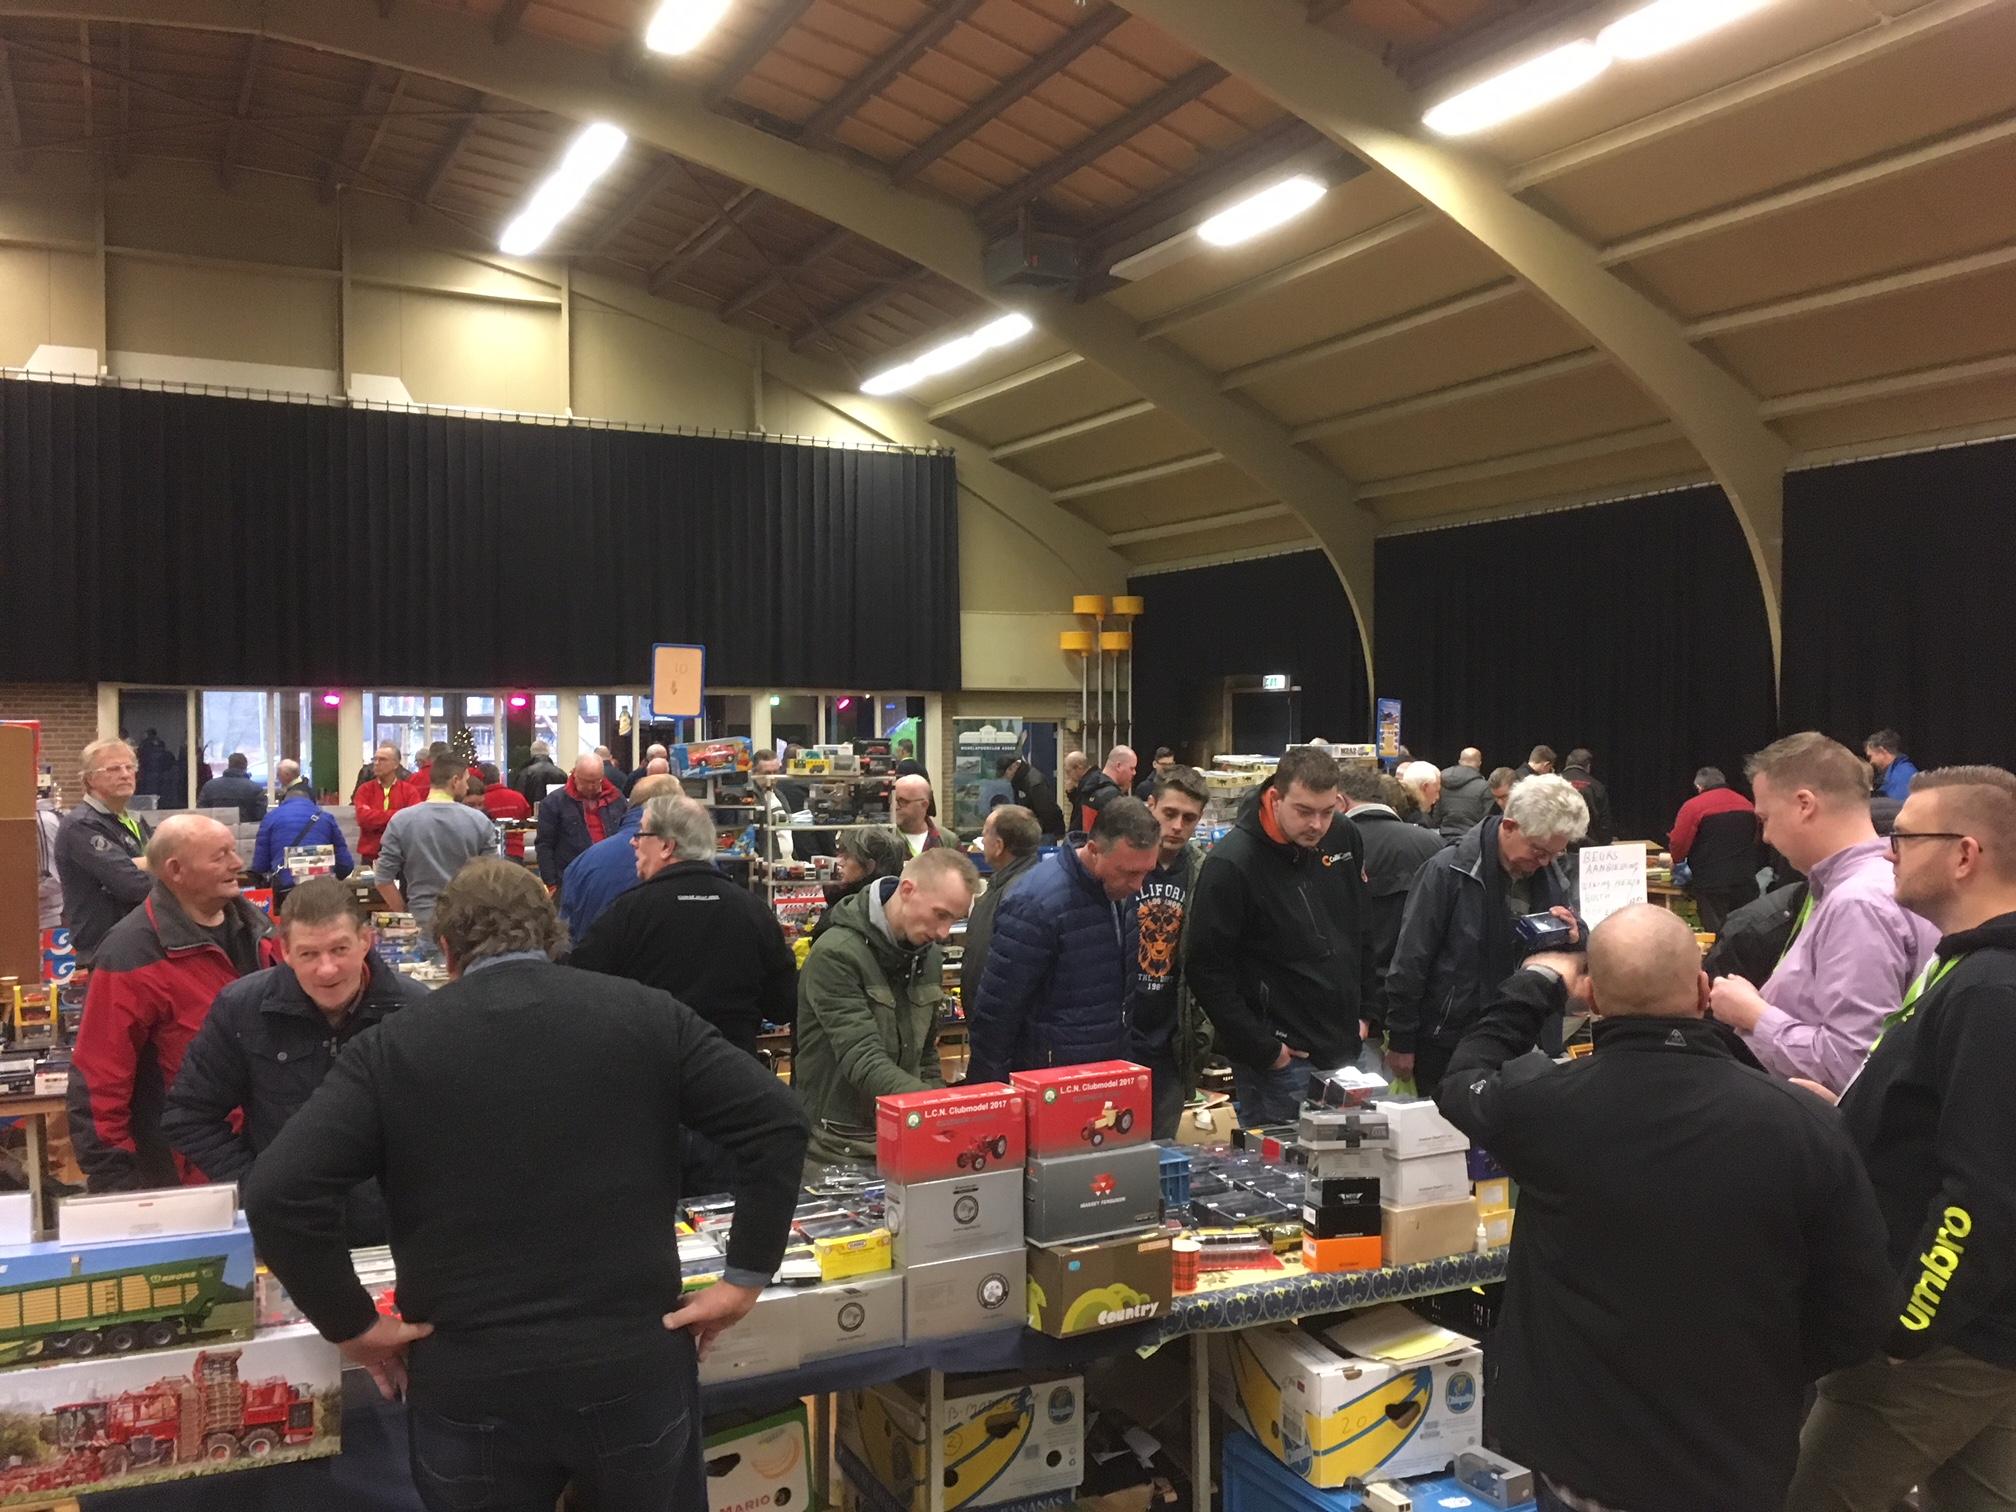 Modelbouwmarkt en Autominiaturenbeurs Leek (21 december 2019)